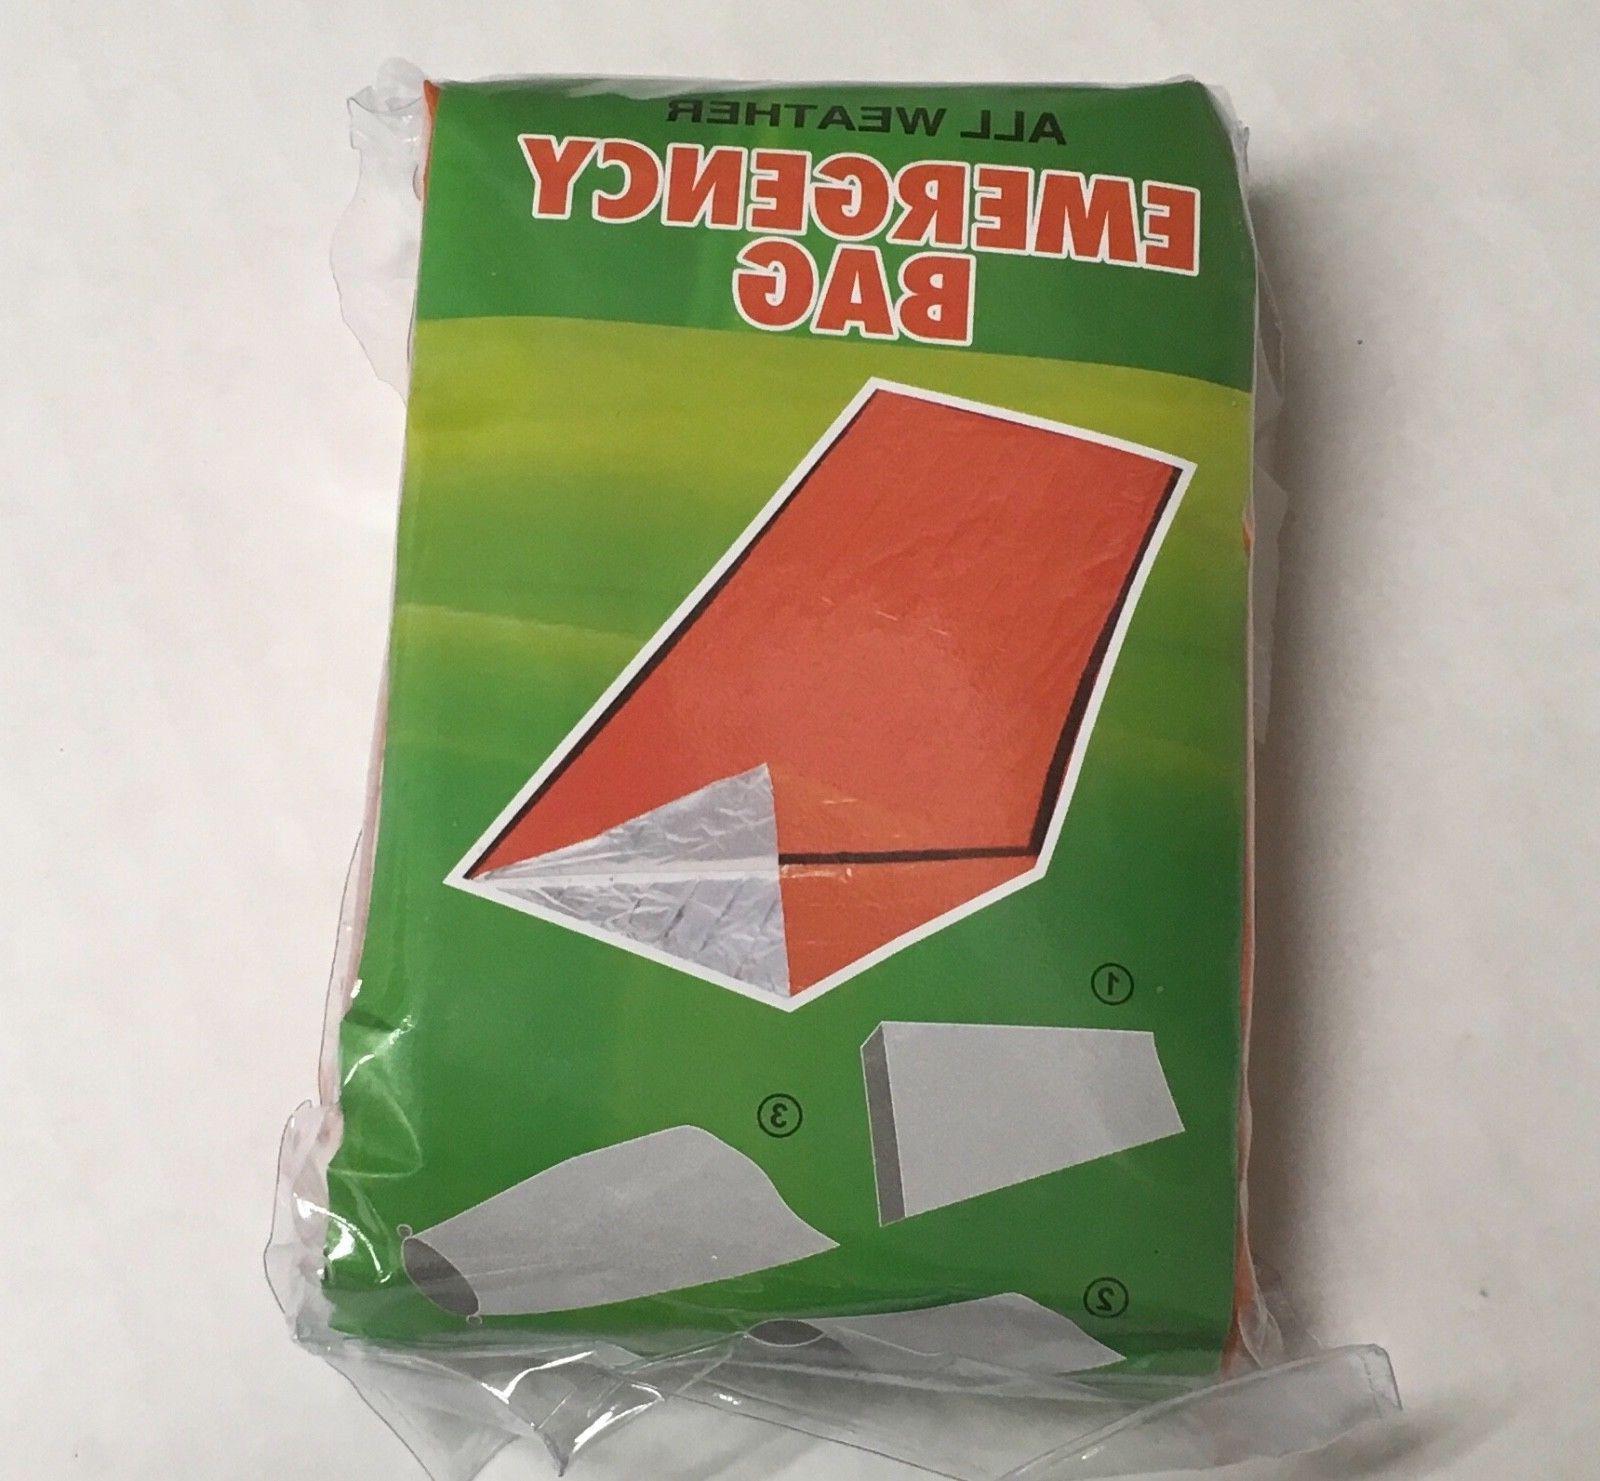 Camping Emergency Gear Kit